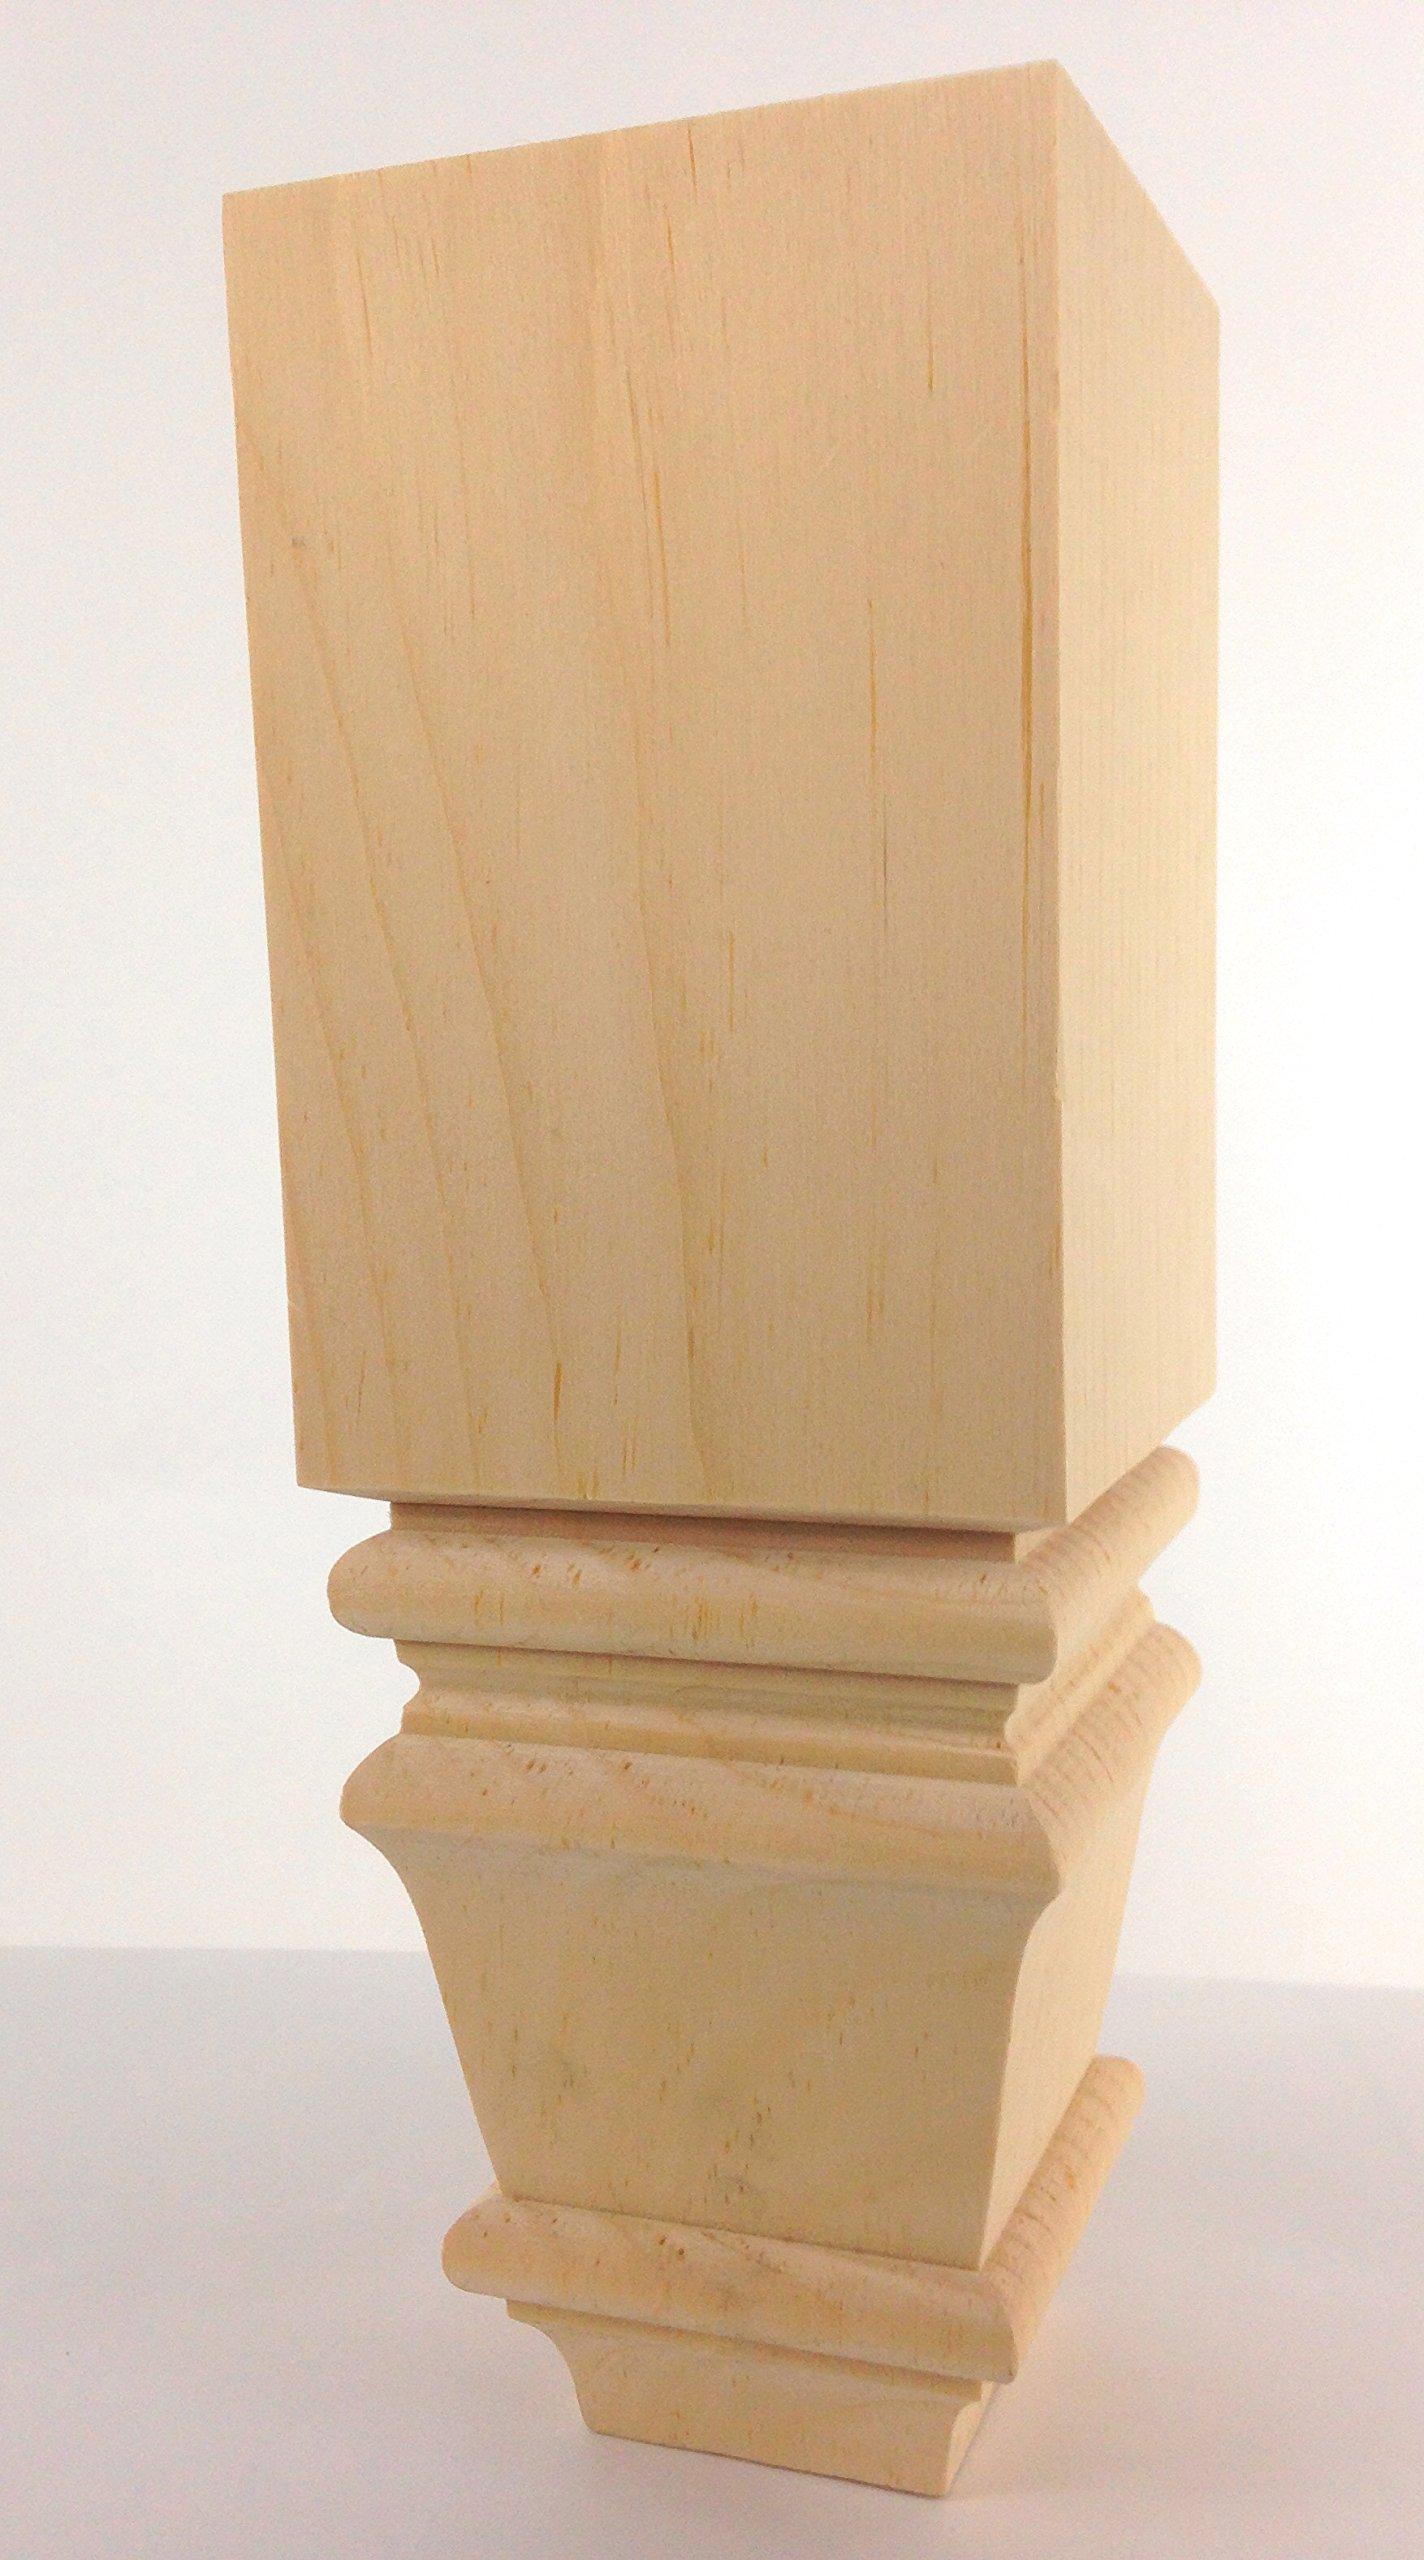 Square Baymont Sofa Leg - 10'' Tall x 3 1/2'' Wide (Pine)